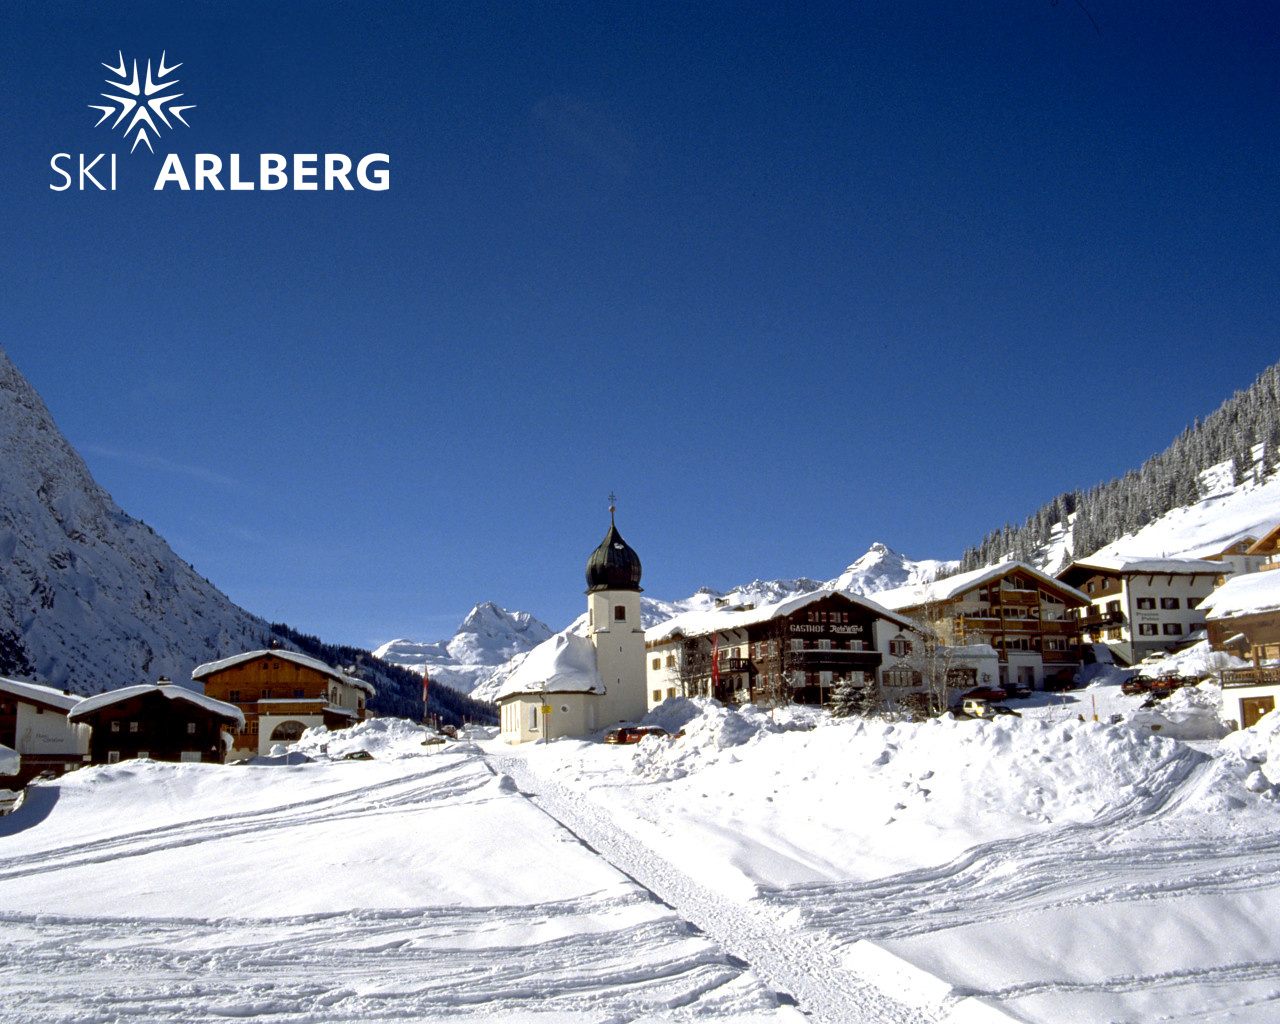 Fotogallery Arlberg